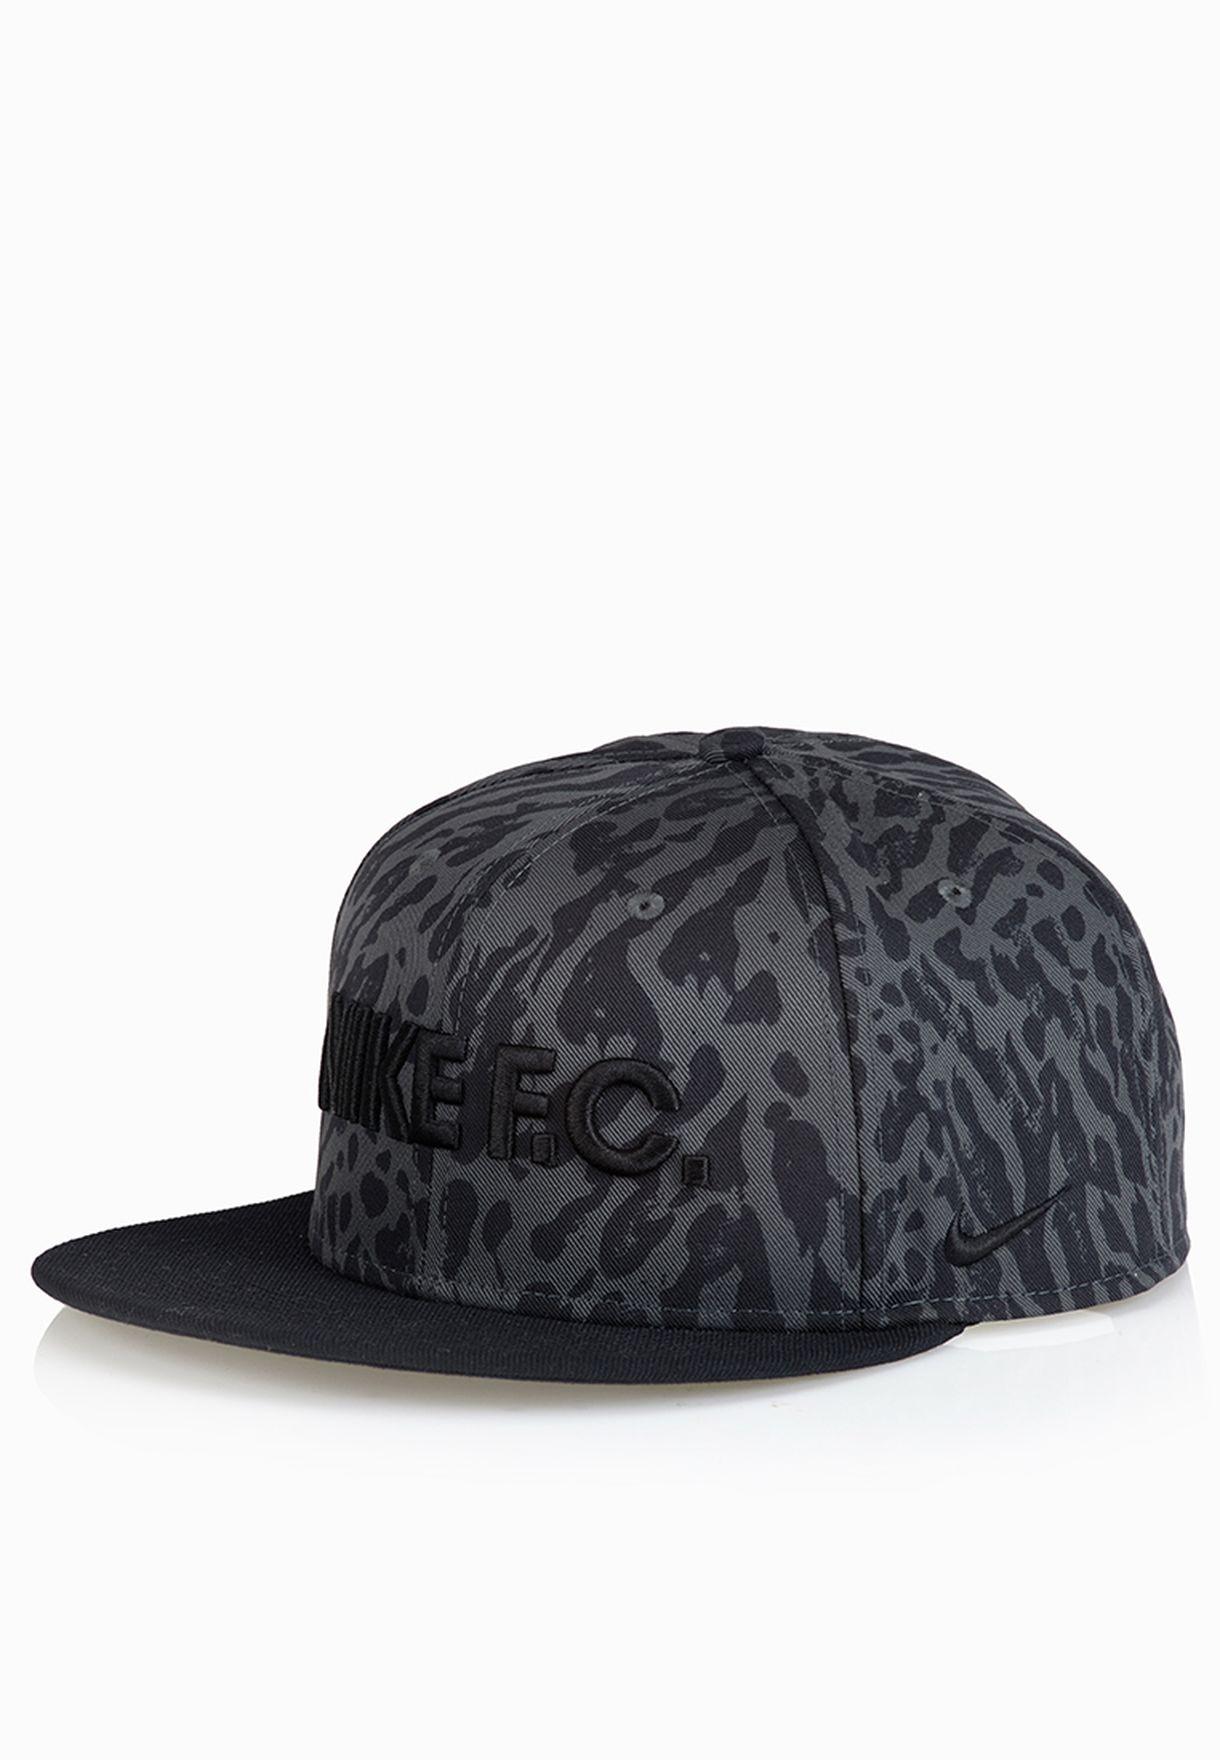 1b62ef5aeb0 Shop Nike black F.C. True Snapback Cap 669789-060 for Men in Saudi -  NI727AC18OKB